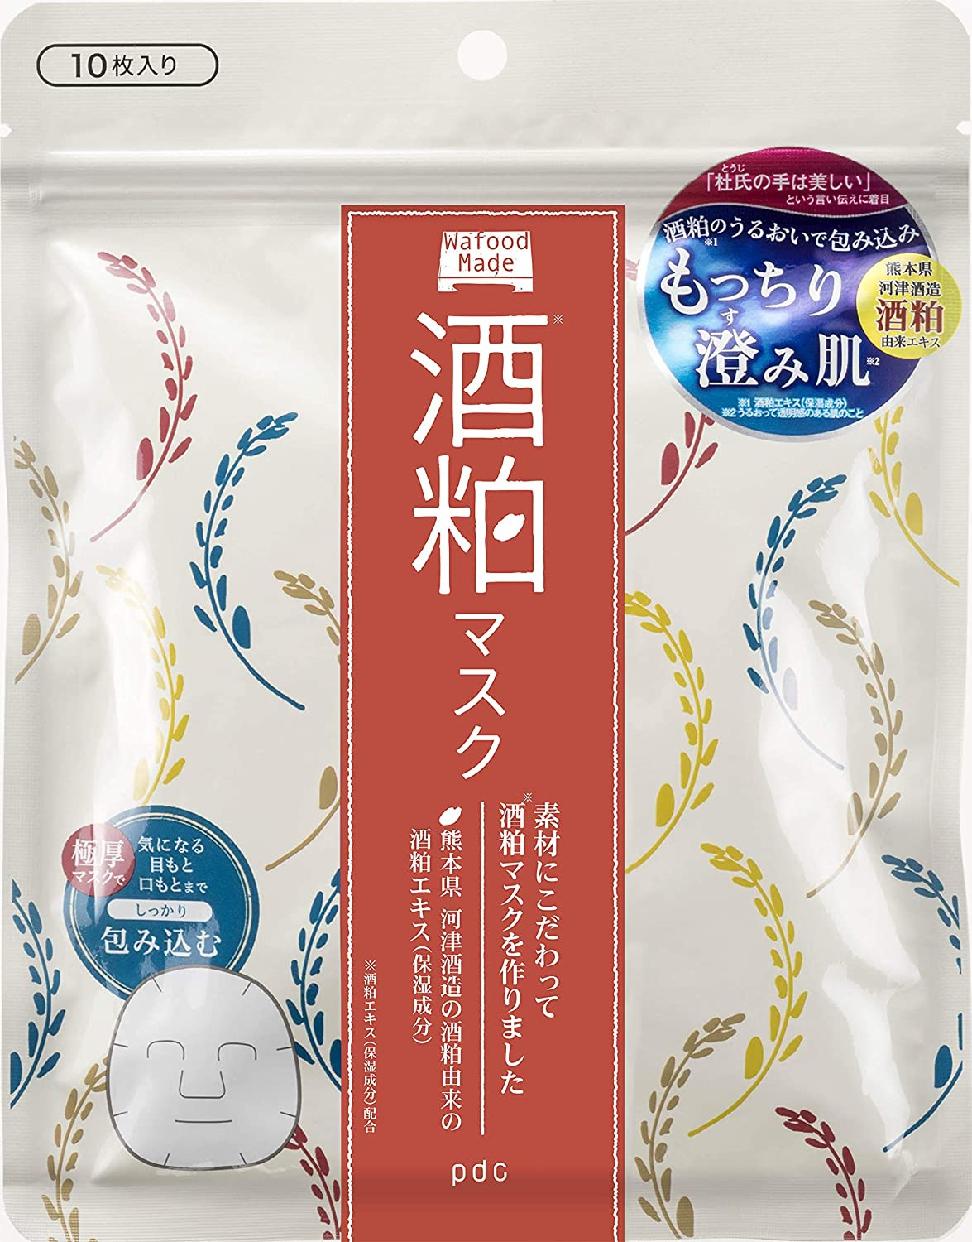 Wafood Made(ワフードメイド) SKマスク (酒粕マスク)